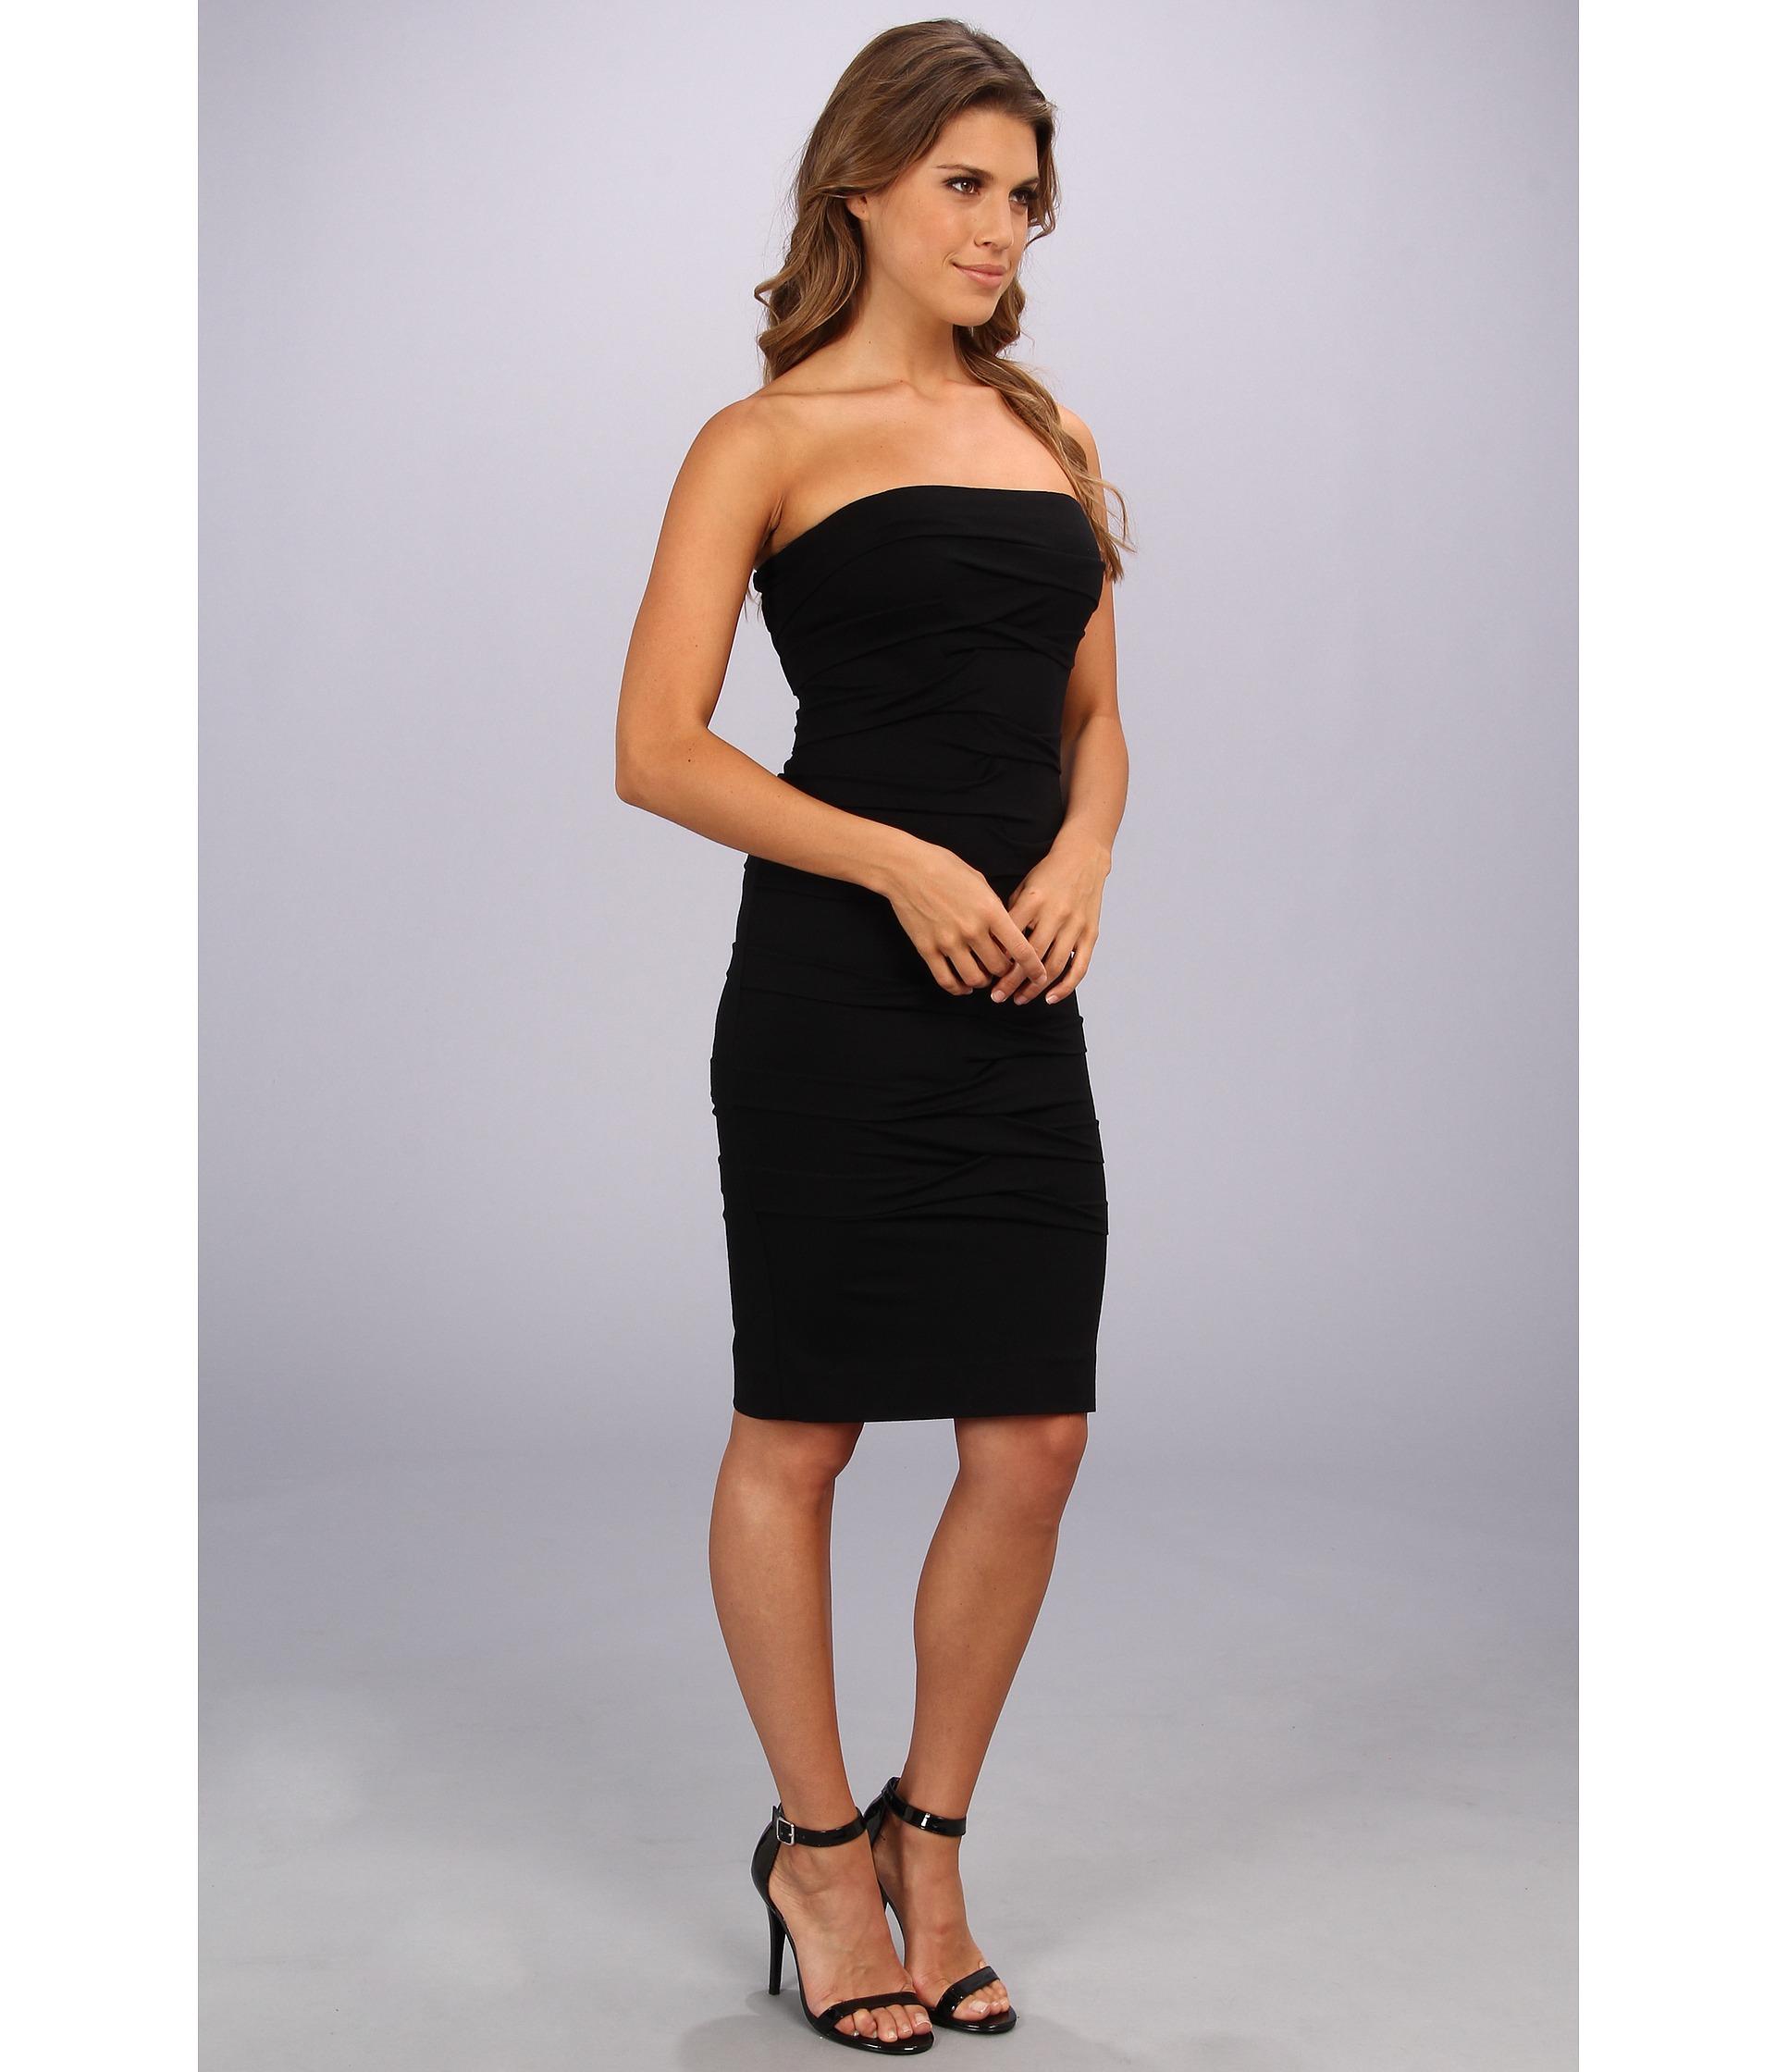 Nicole Miller Tidal Tube Dress in Black   Lyst - photo#8